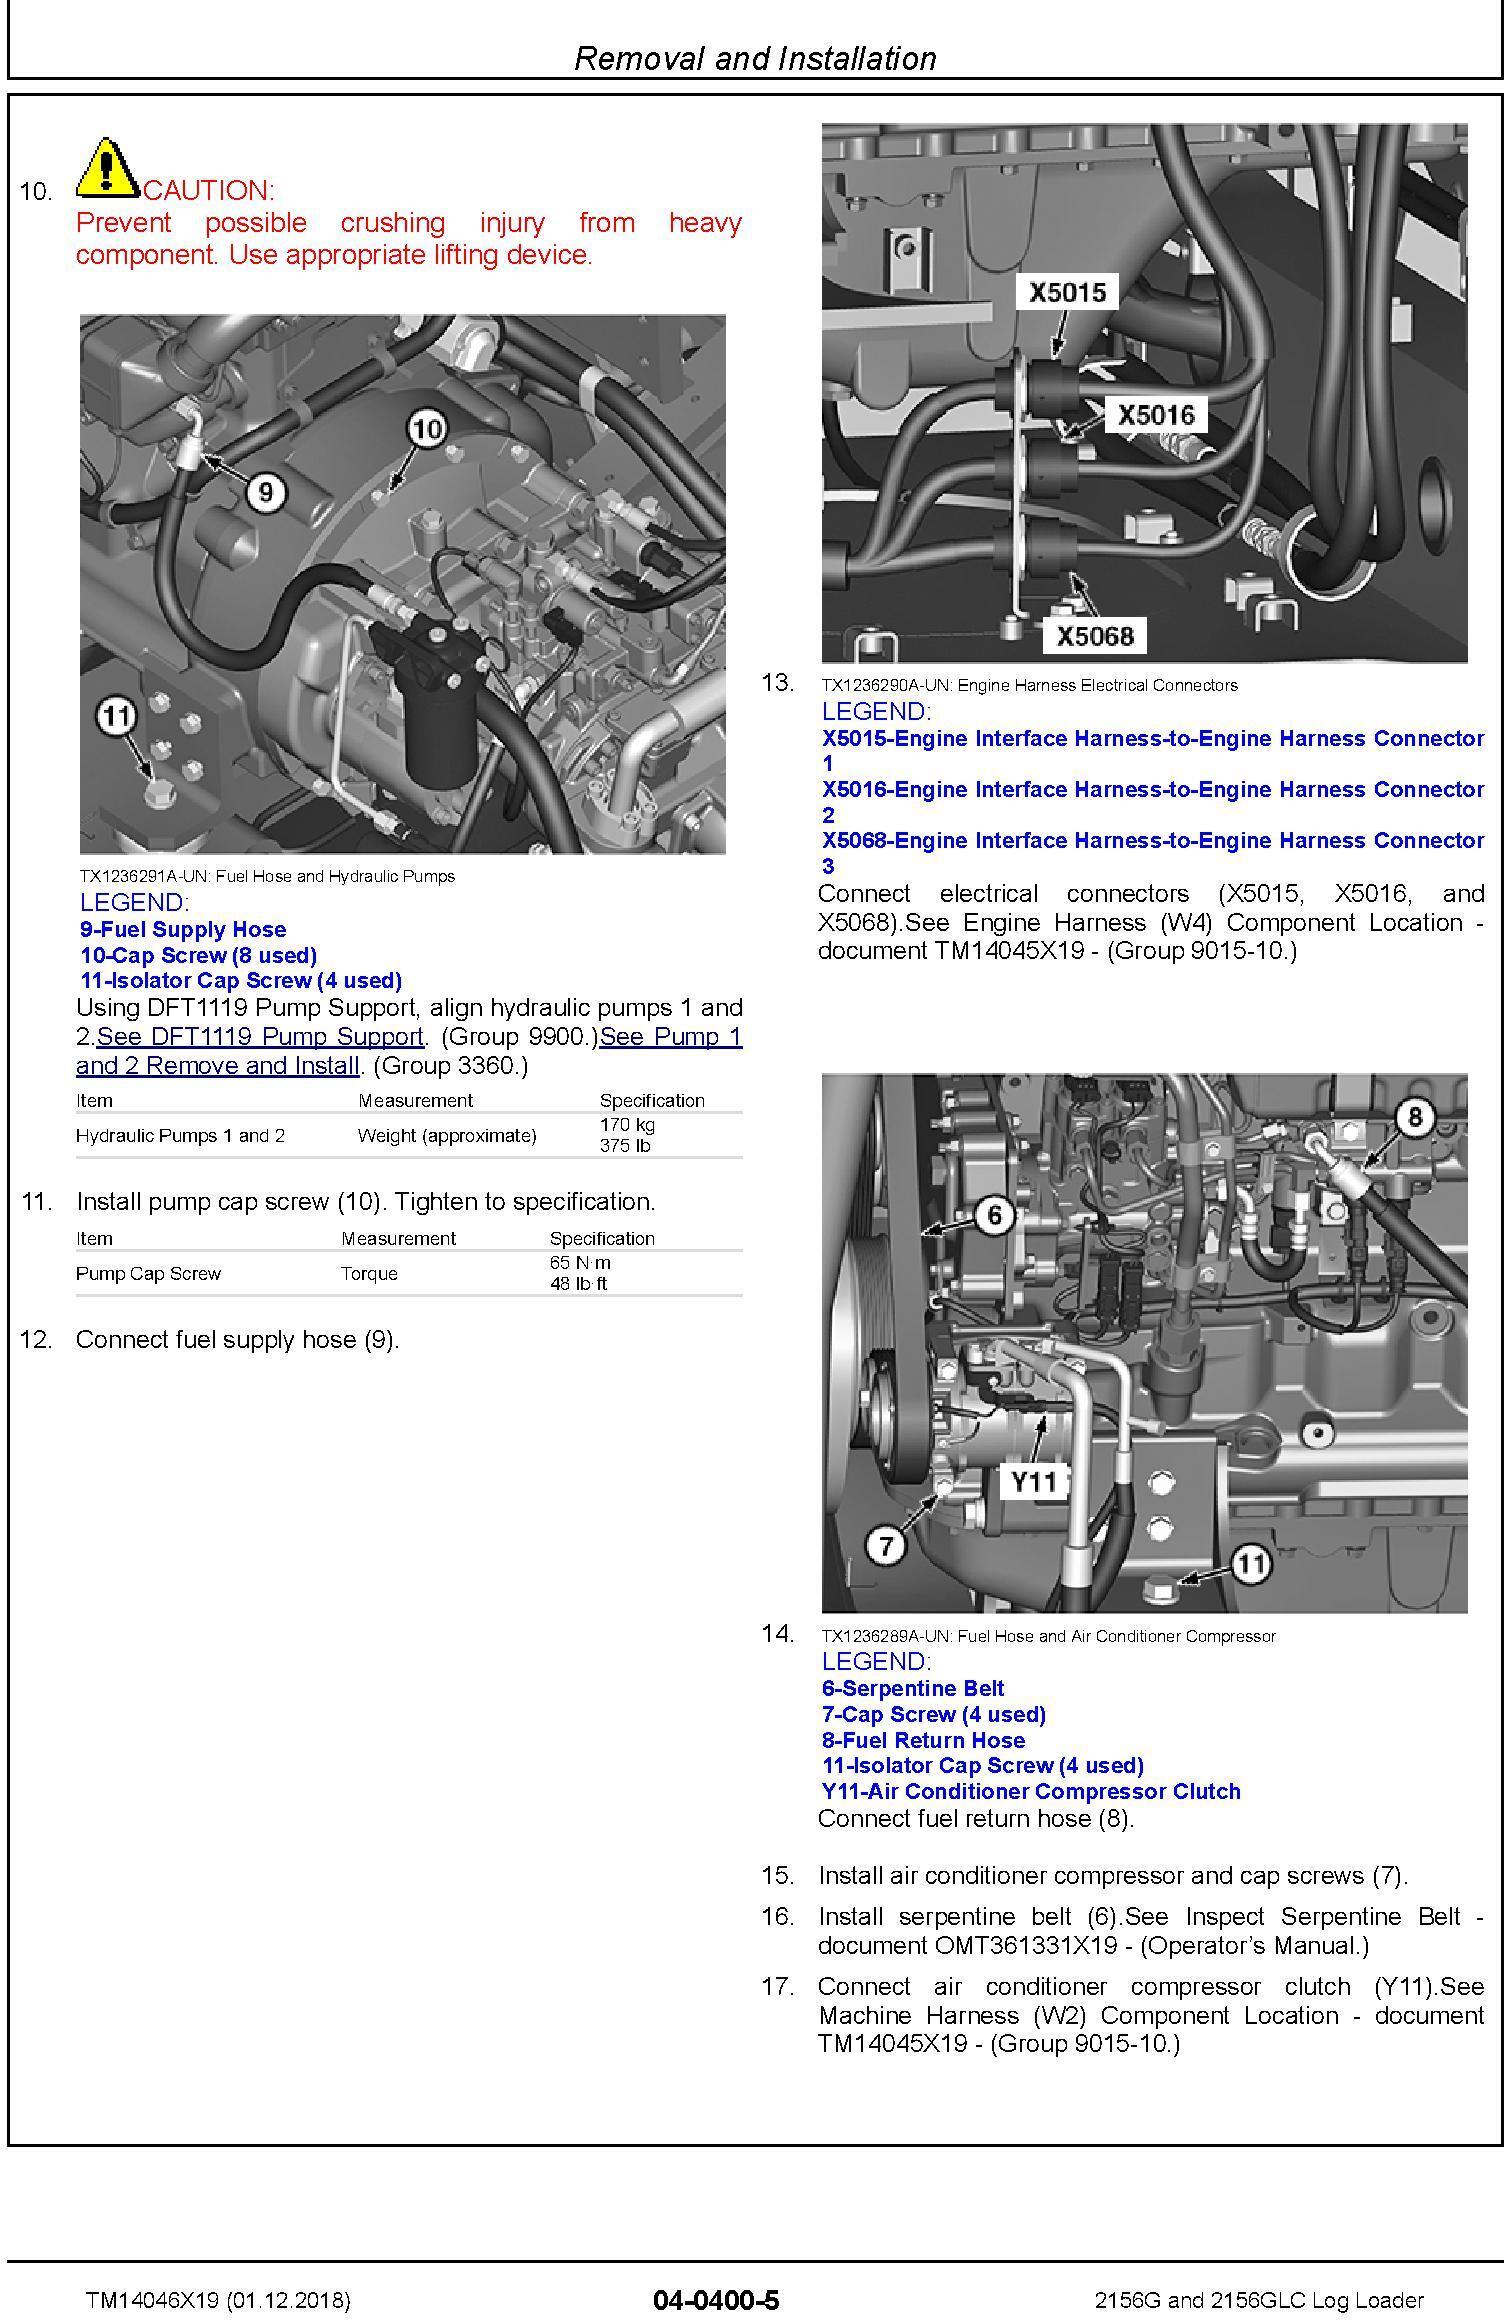 John Deere 2156G, 2156GLC (SN. F216001-) Log Loader Repair Technical Service Manual (TM14046X19) - 3